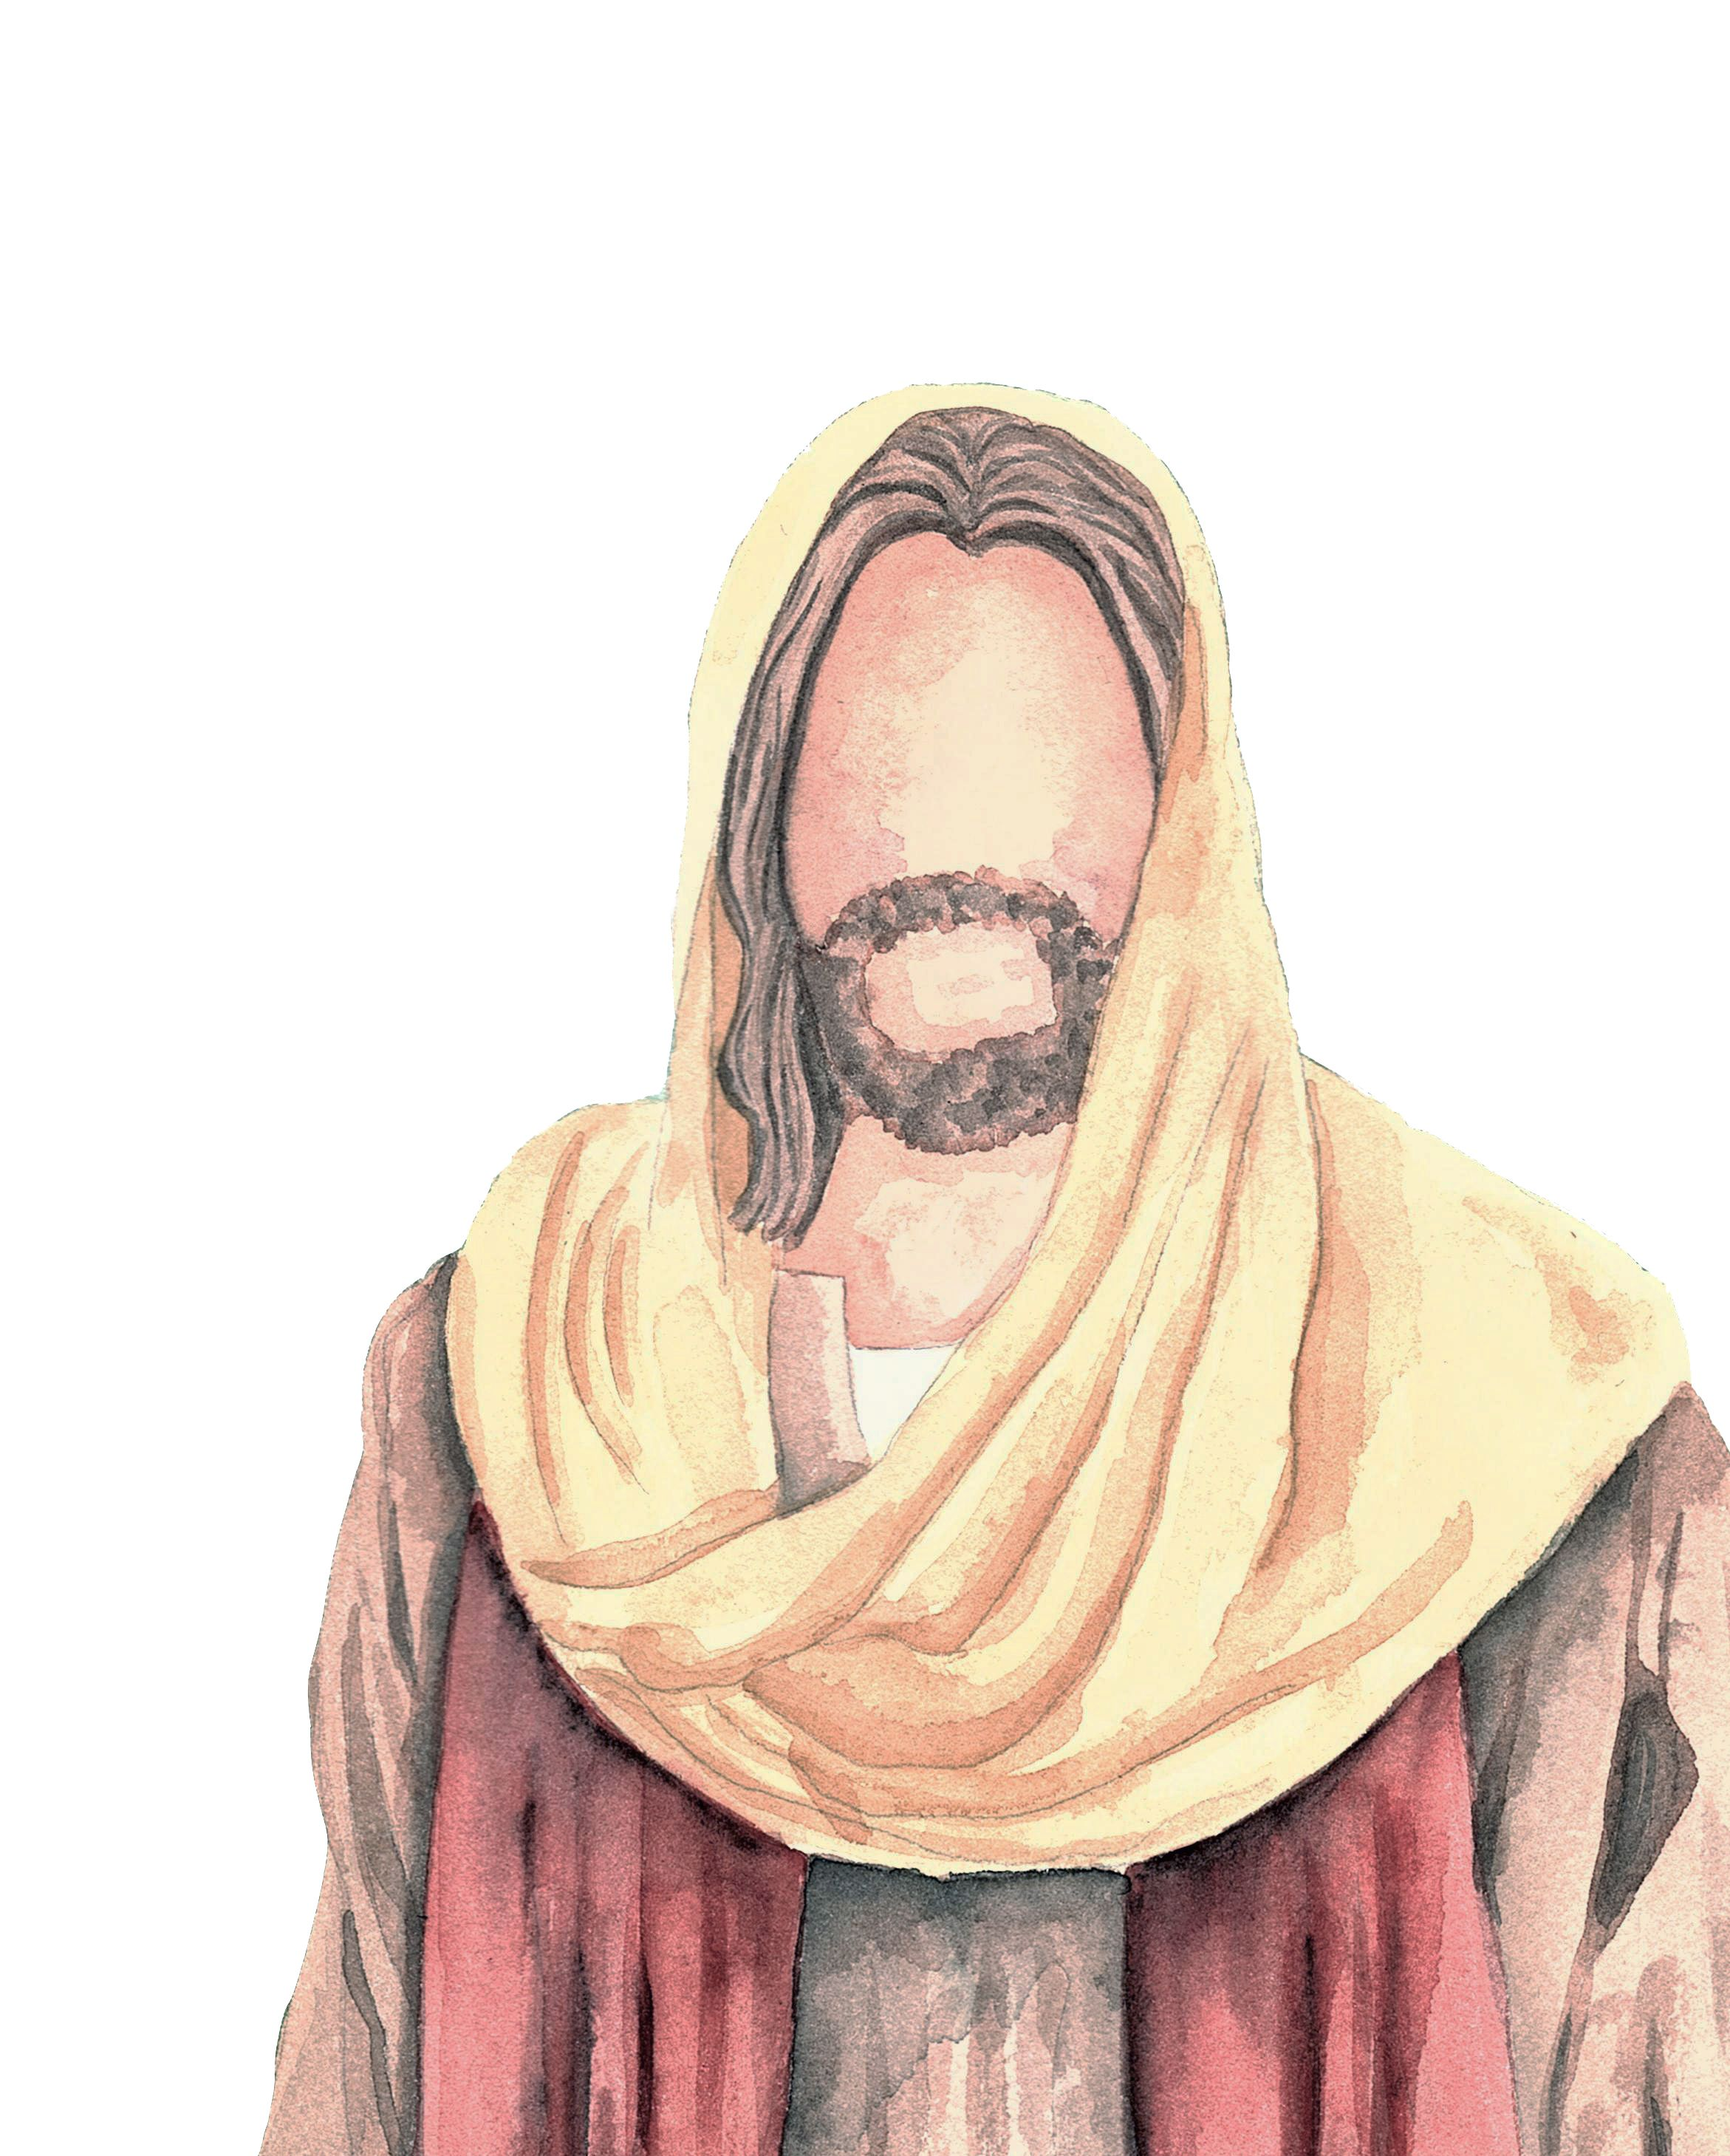 Watercolor portrait of Jesus Christ instagram @_sapgreen  Jesus